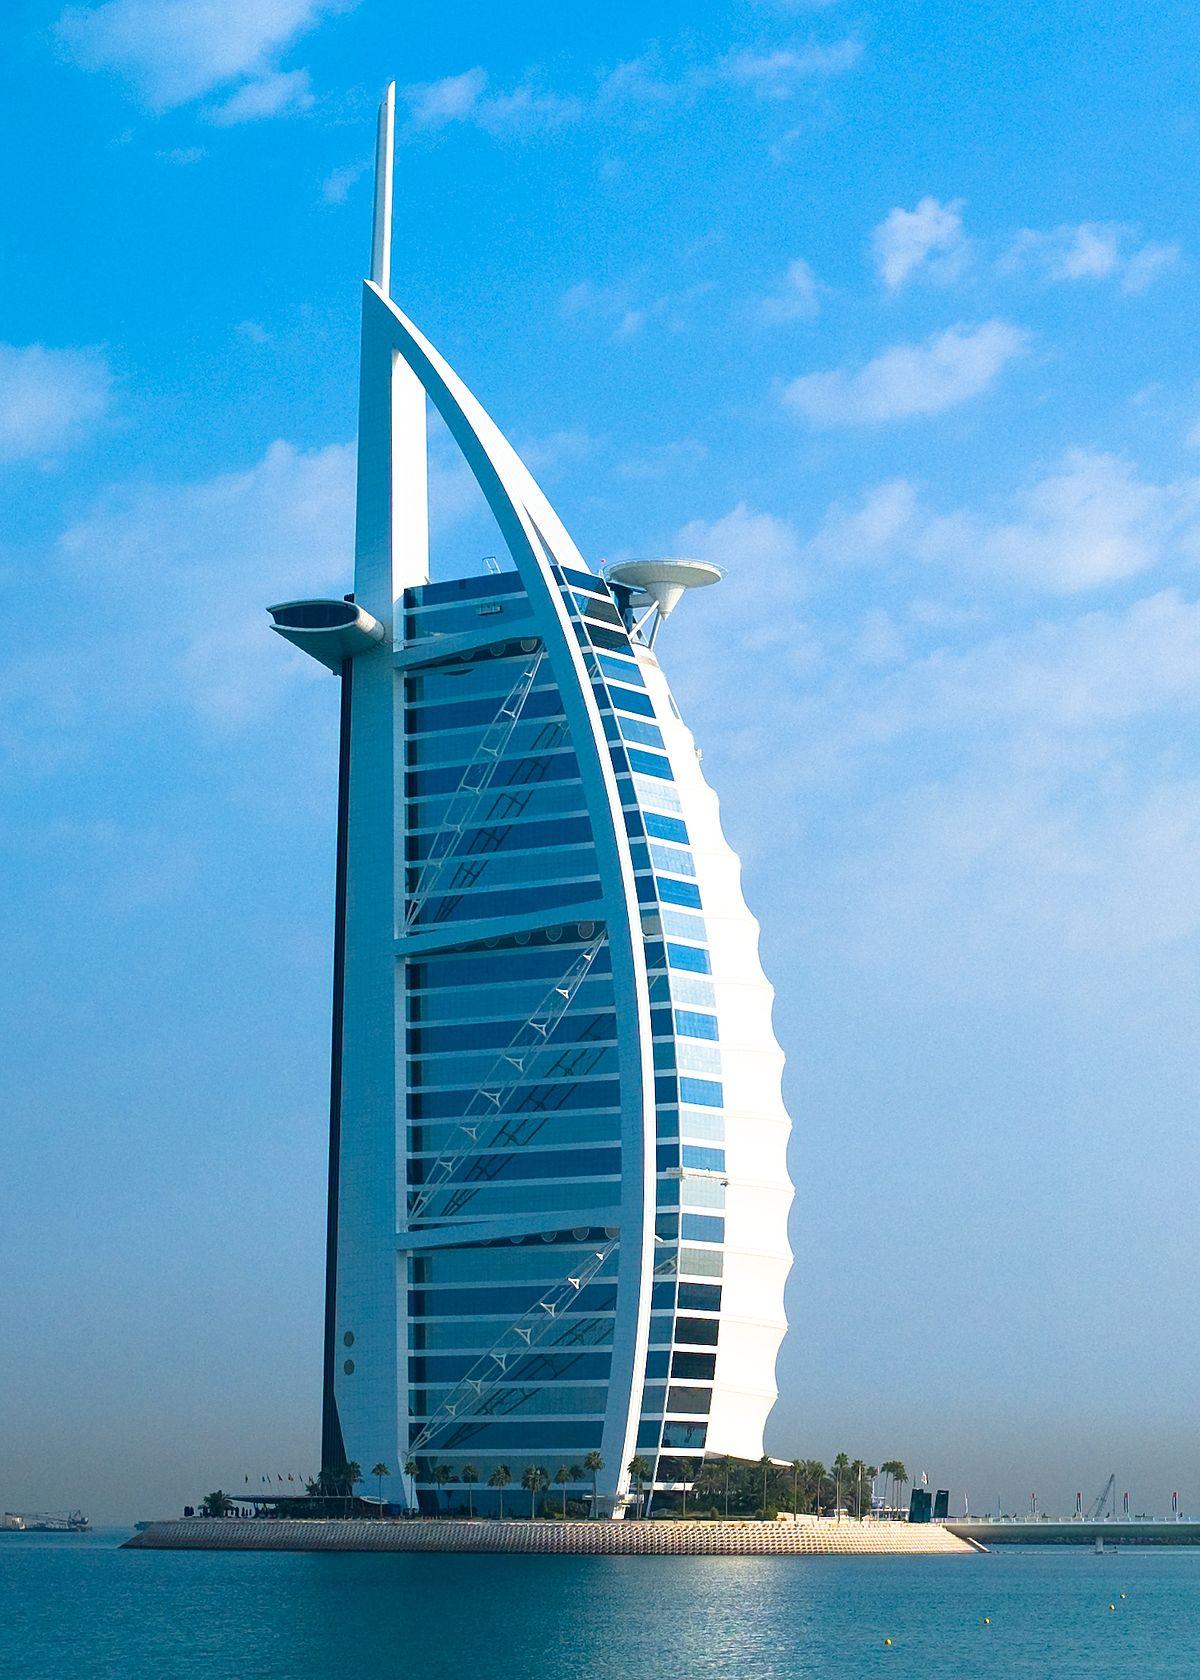 Burj al arab photo